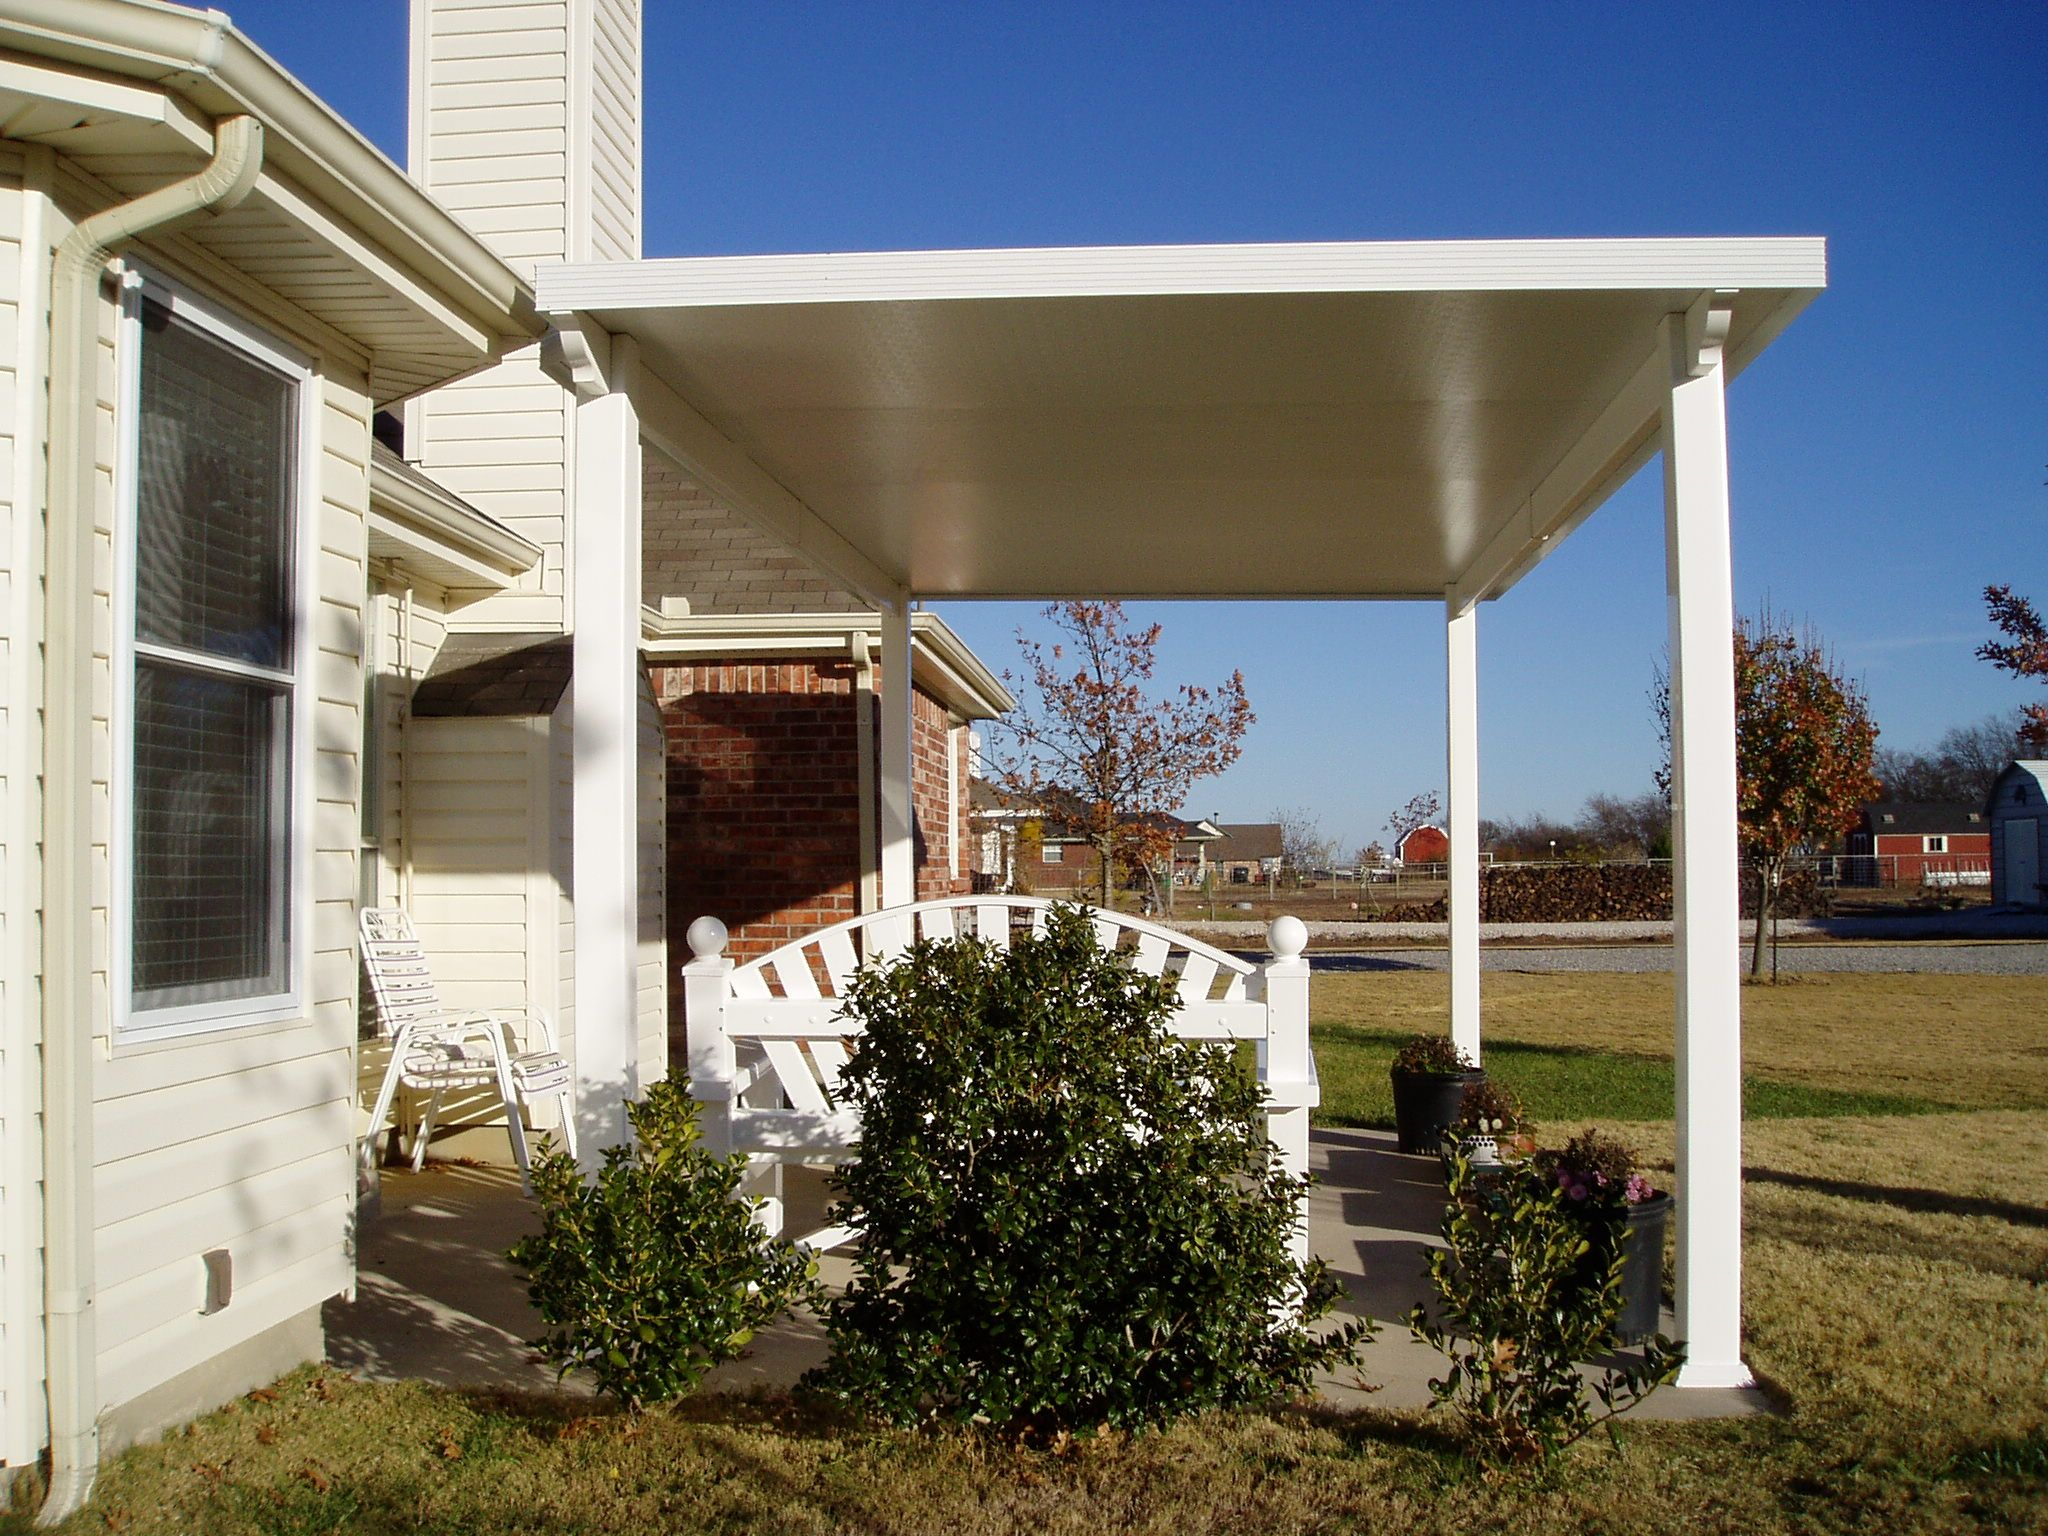 Beau Future Outdoors 972 576 1600 Dallas TEXAS Aluminum Patio Covers, Vinyl  Pergolas, Vinyl Fencing, Vinyl Decks